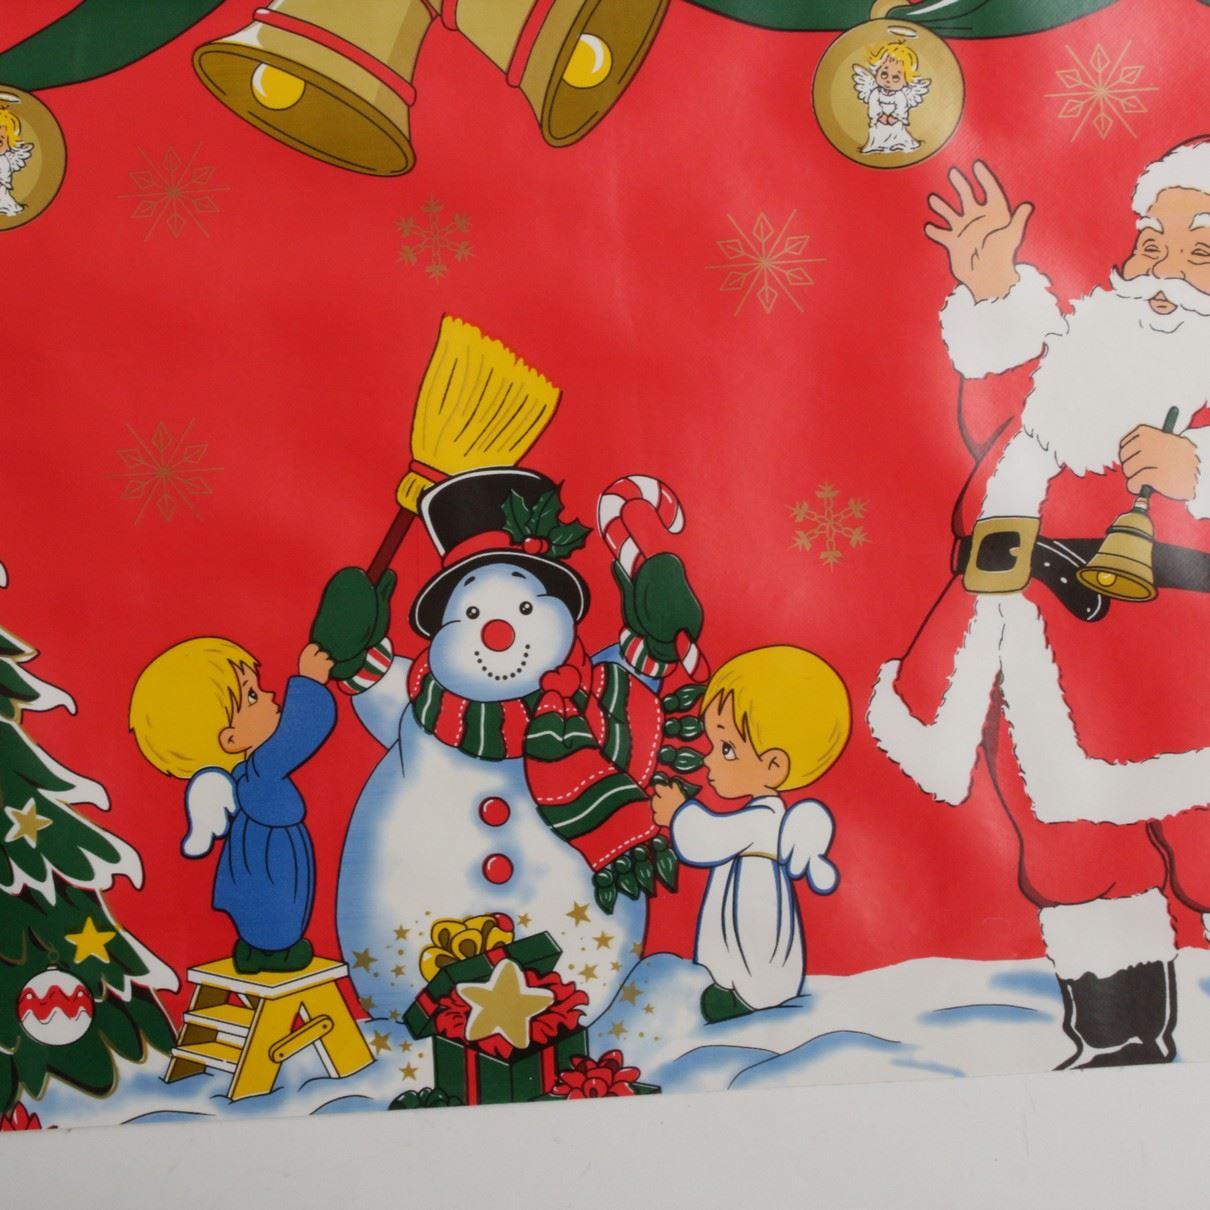 thumbnail 32 - CHRISTMAS PVC OILCLOTH VINYL FABRIC XMAS KITCHEN TABLE WIPECLEAN TABLECLOTHS